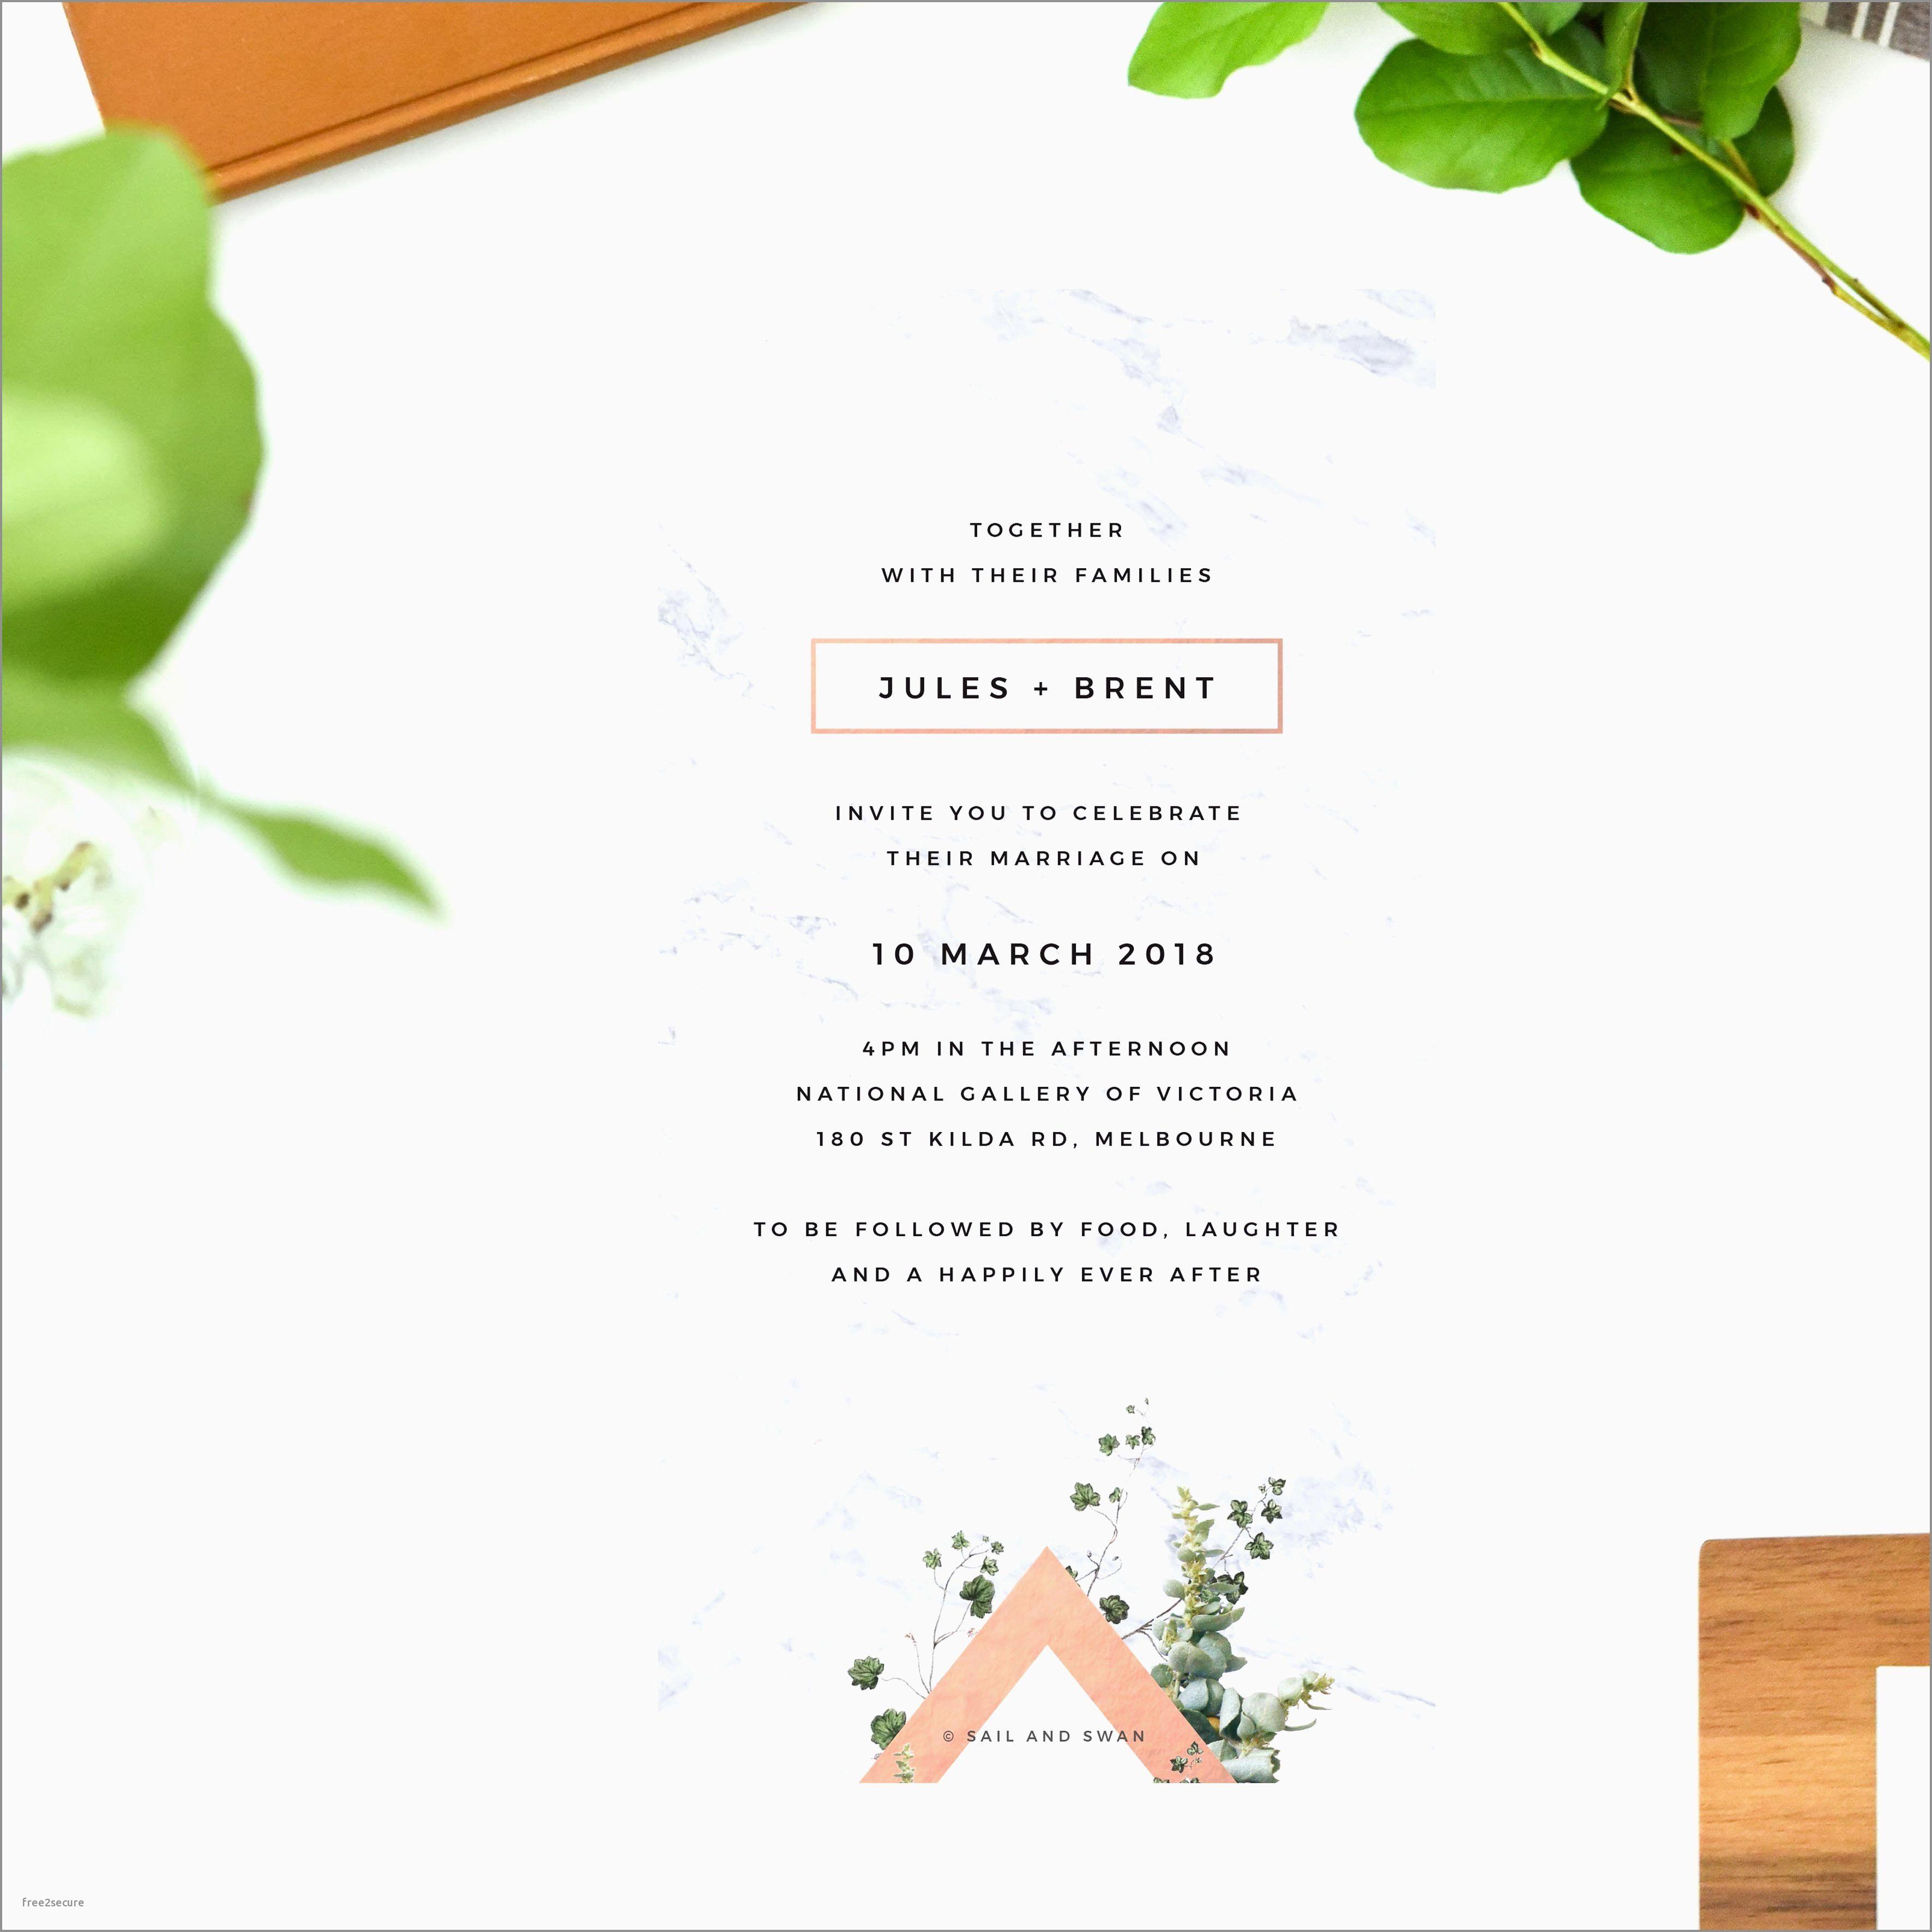 Vietnamese Wedding Invitation Template Elegant Vietnamese Wedding Invitation W Cheap Wedding Invitations Casual Wedding Invitations Amazing Wedding Invitations